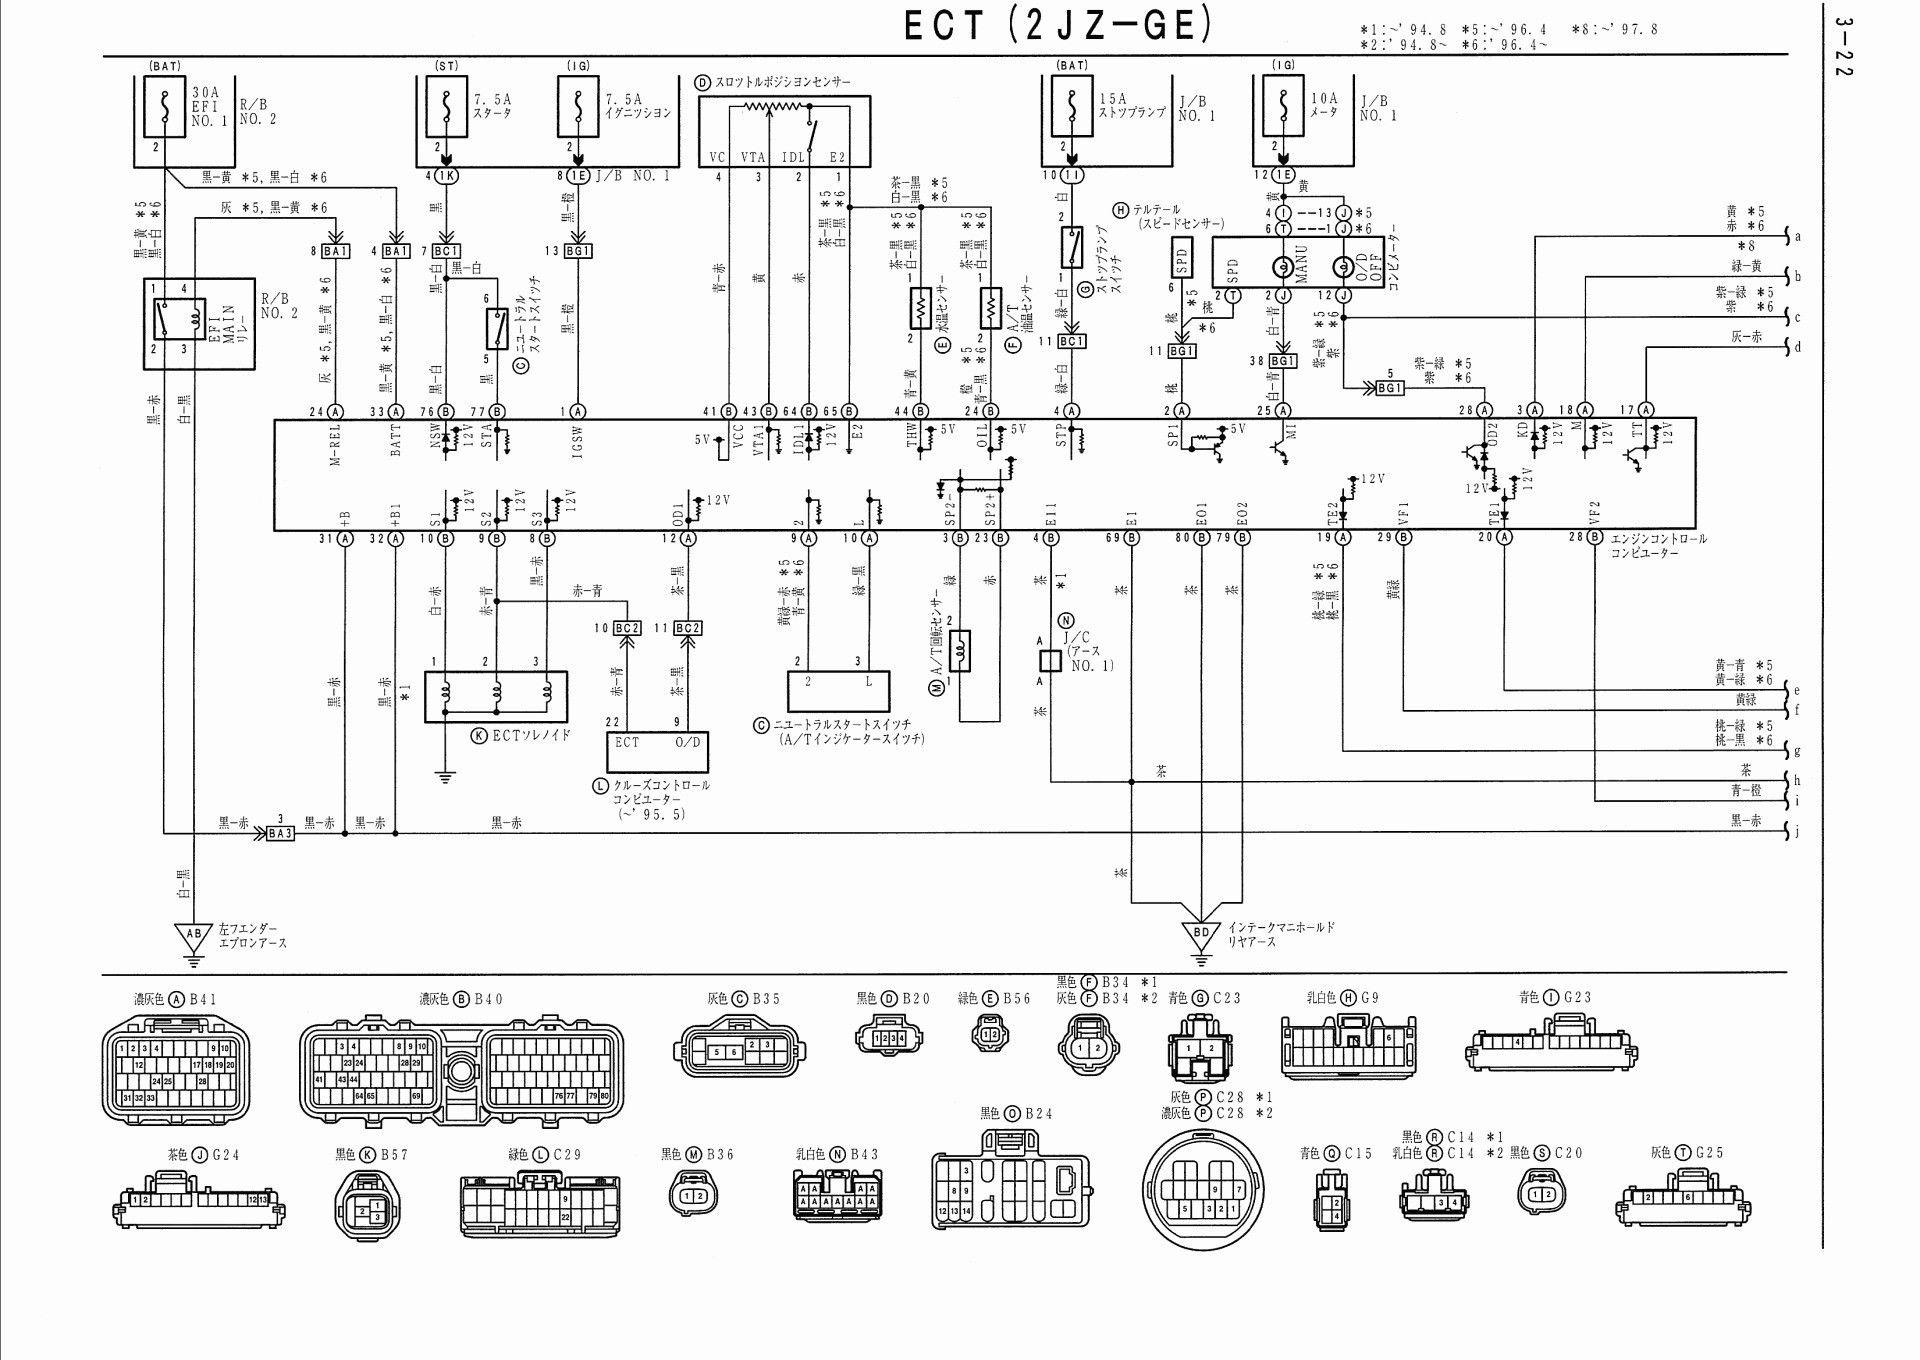 Bmw E46 Dme Wiring Diagram Diagram Diagramtemplate Diagramsample Electrical Diagram Diagram Electrical Wiring Diagram